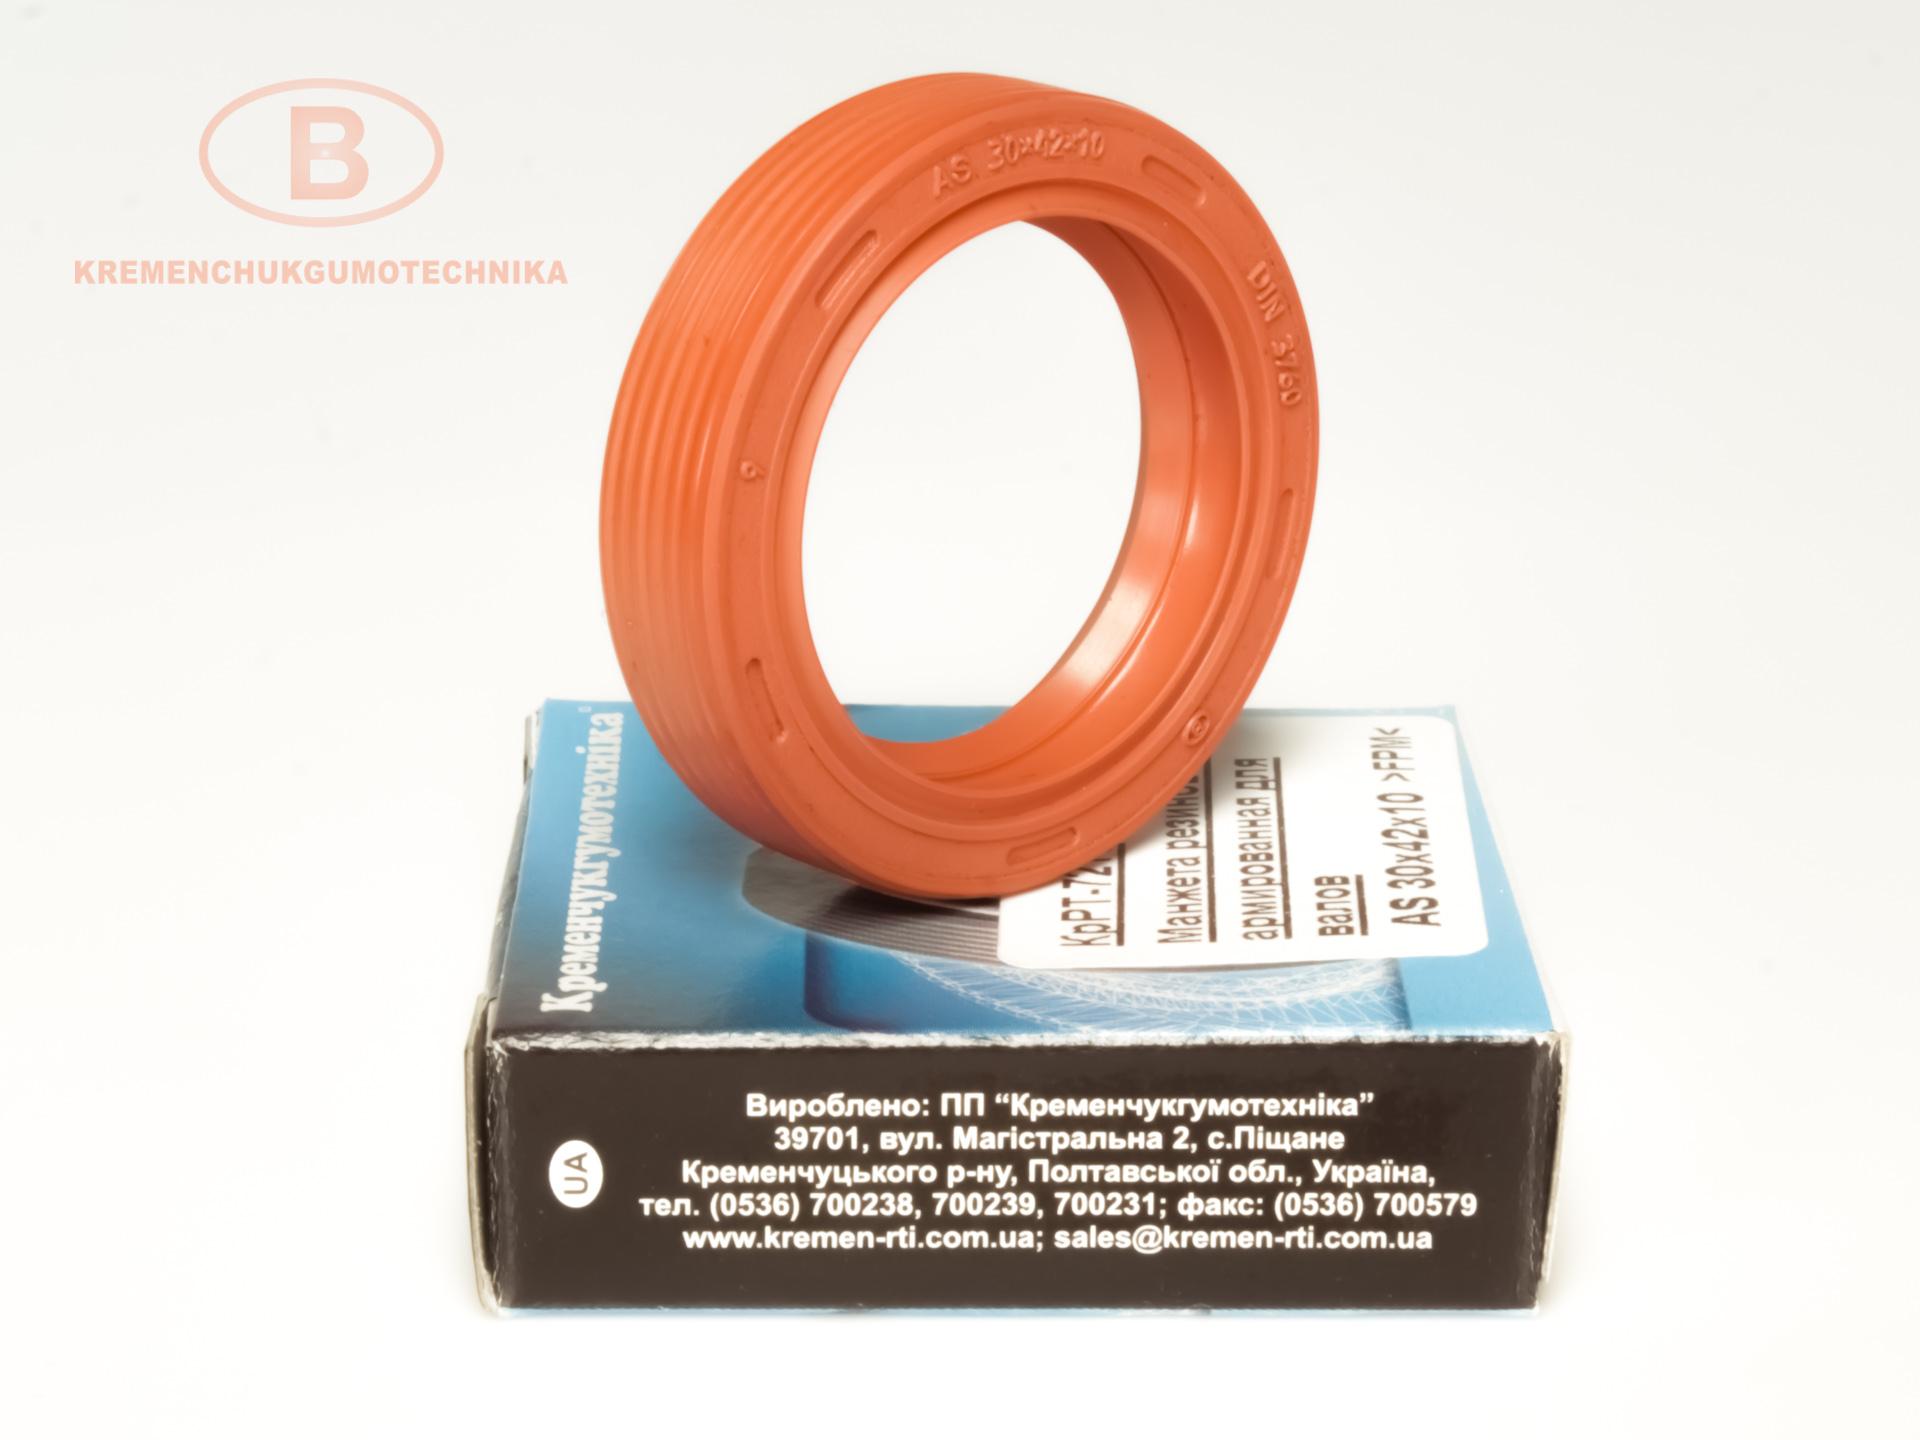 Radial-Wellendichtring DIN 3760 AS 17,0 x 32,0 x 7,0 mm NBR 1 St.